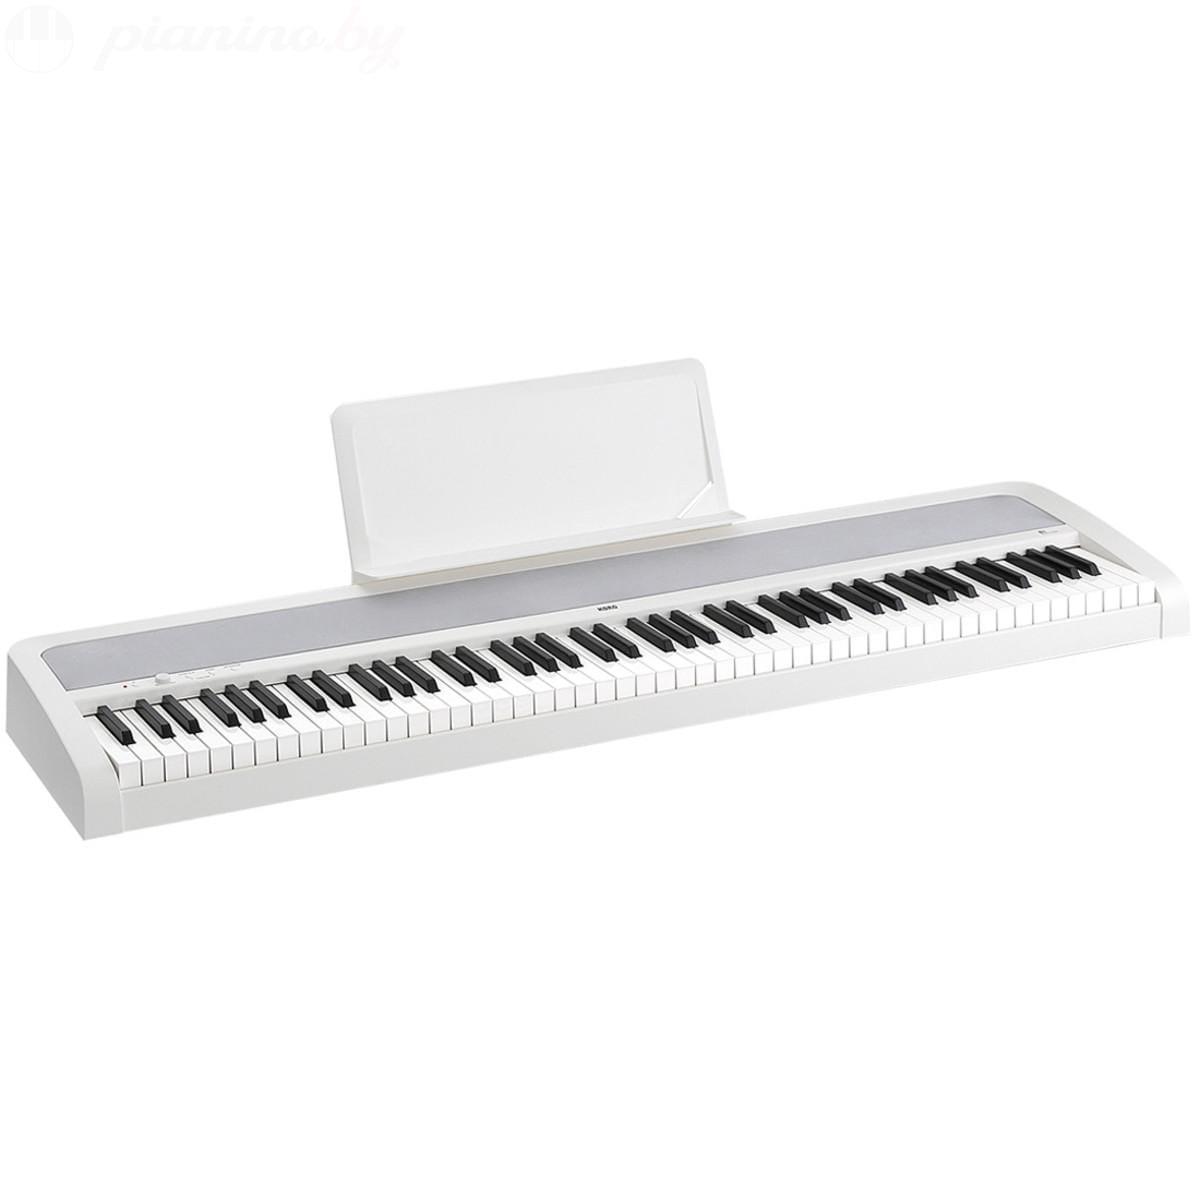 Цифровое пианино Korg B1-WH Фото 1